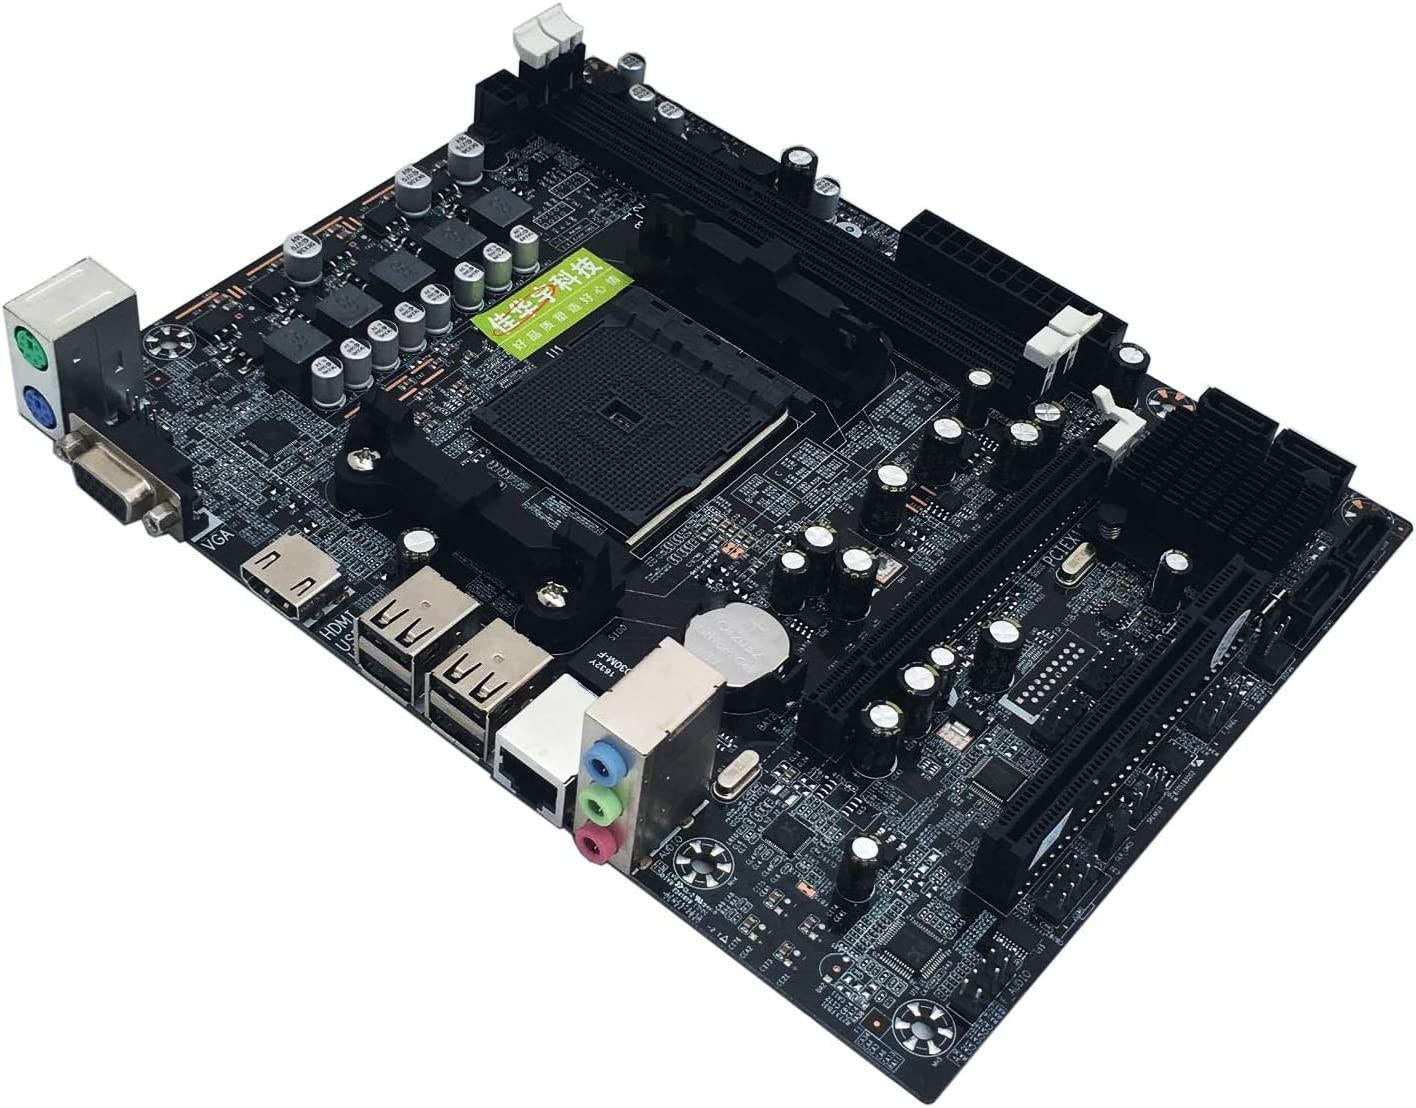 MeterMall Motherboards A88 Desktop Motherboard FM2 Desktop Motherboard Support DDR3 16G Support 7650K VGA HDMI SATA3.0